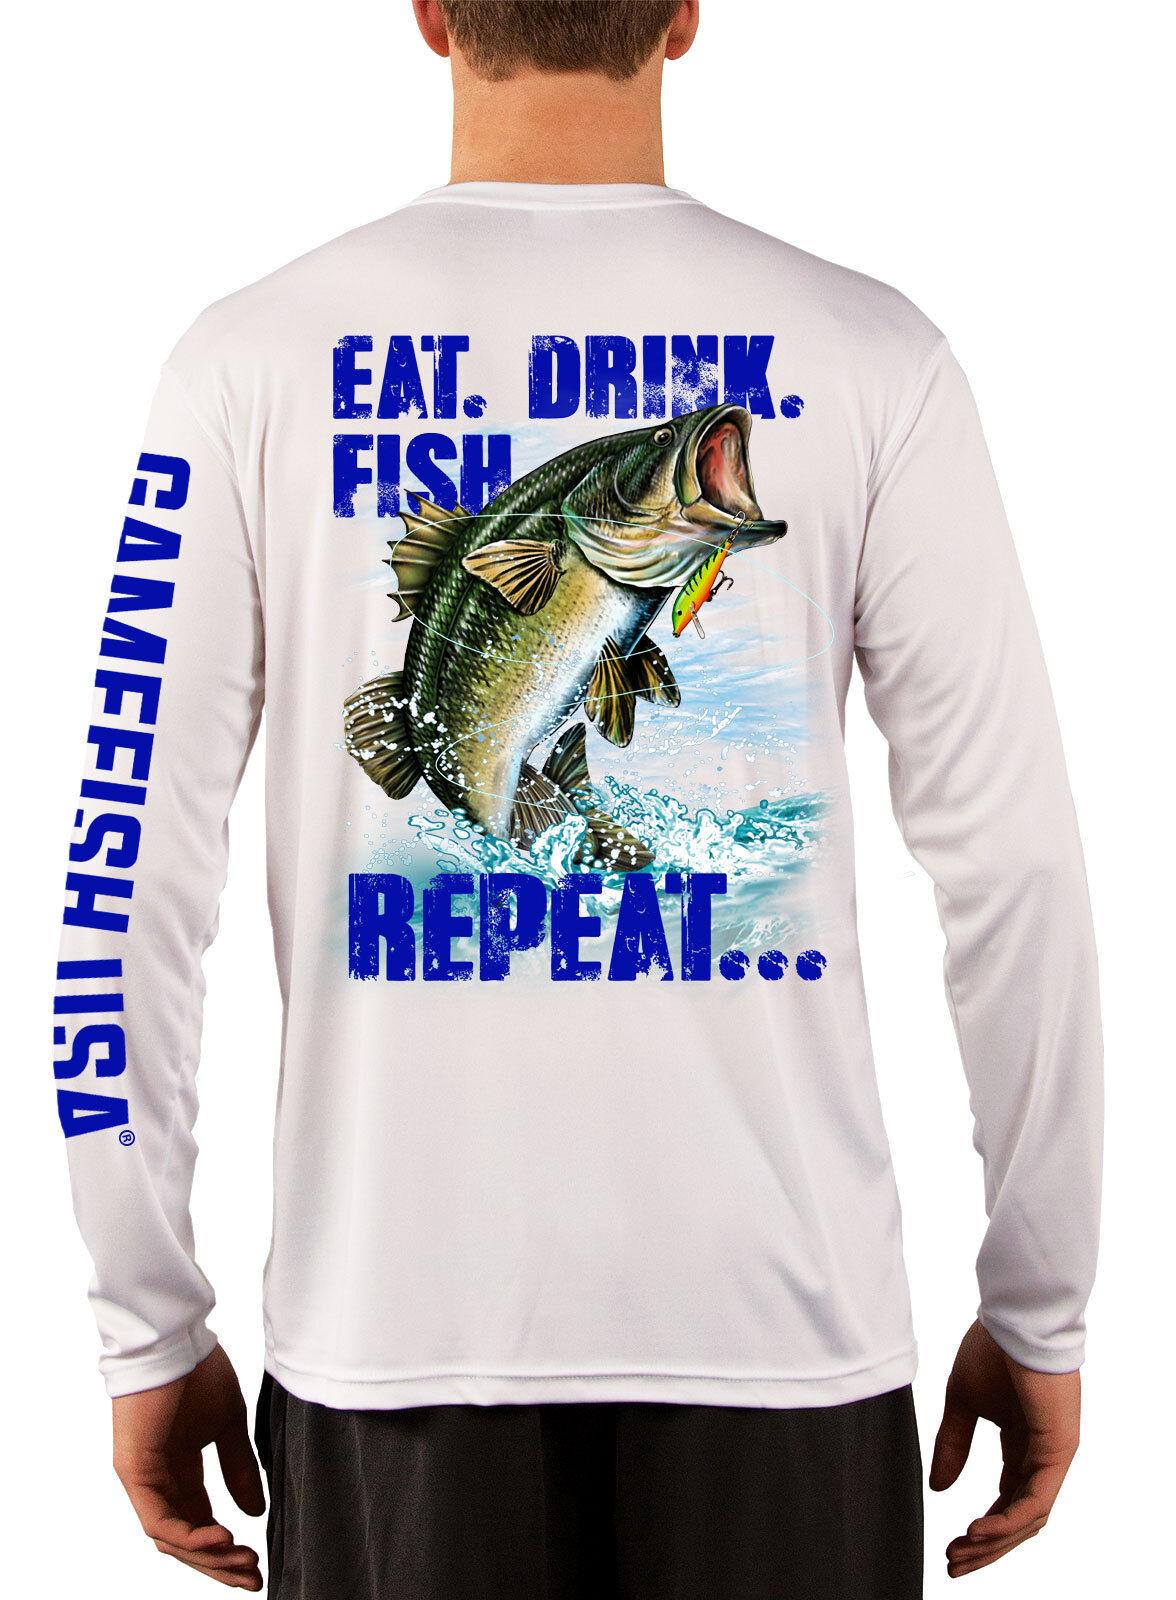 3958abe3 Men's UPF 50 Long Sleeve Microfiber Performance Fishing Shirt Bass Repeat